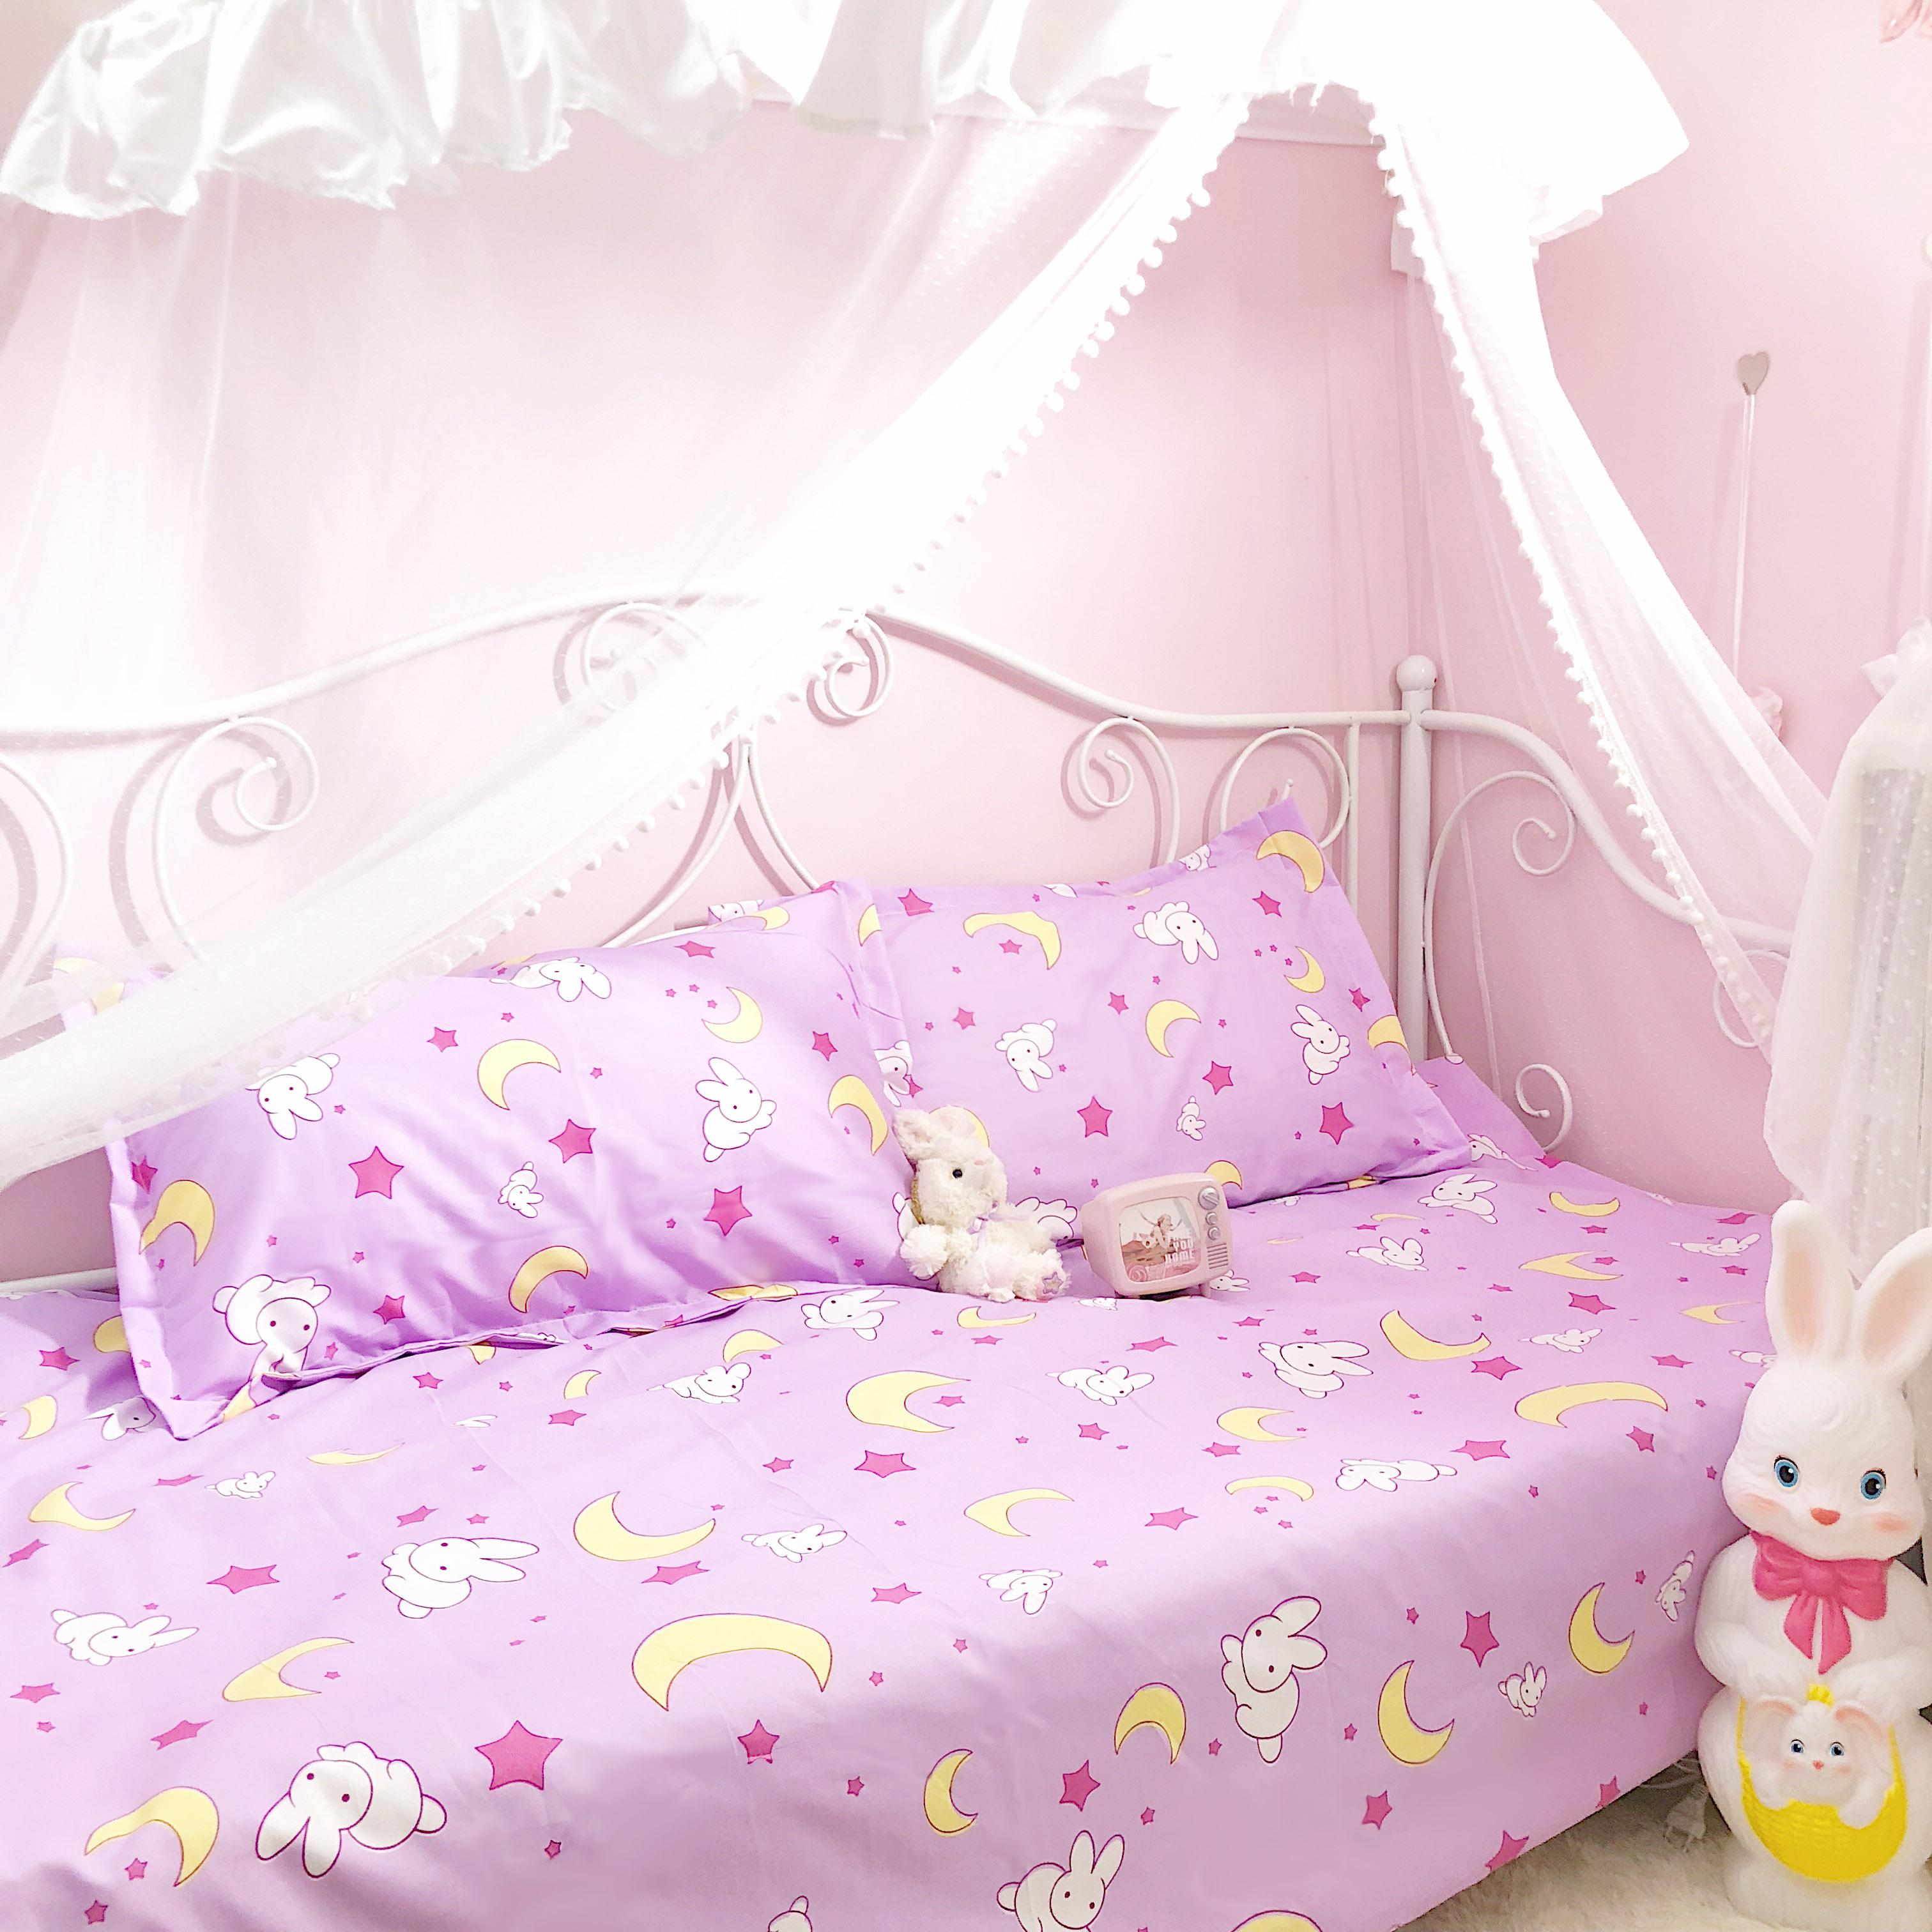 Großhandel Sailor Moon Anime Cartoon Plüsch Bettwäsche Bettbezug